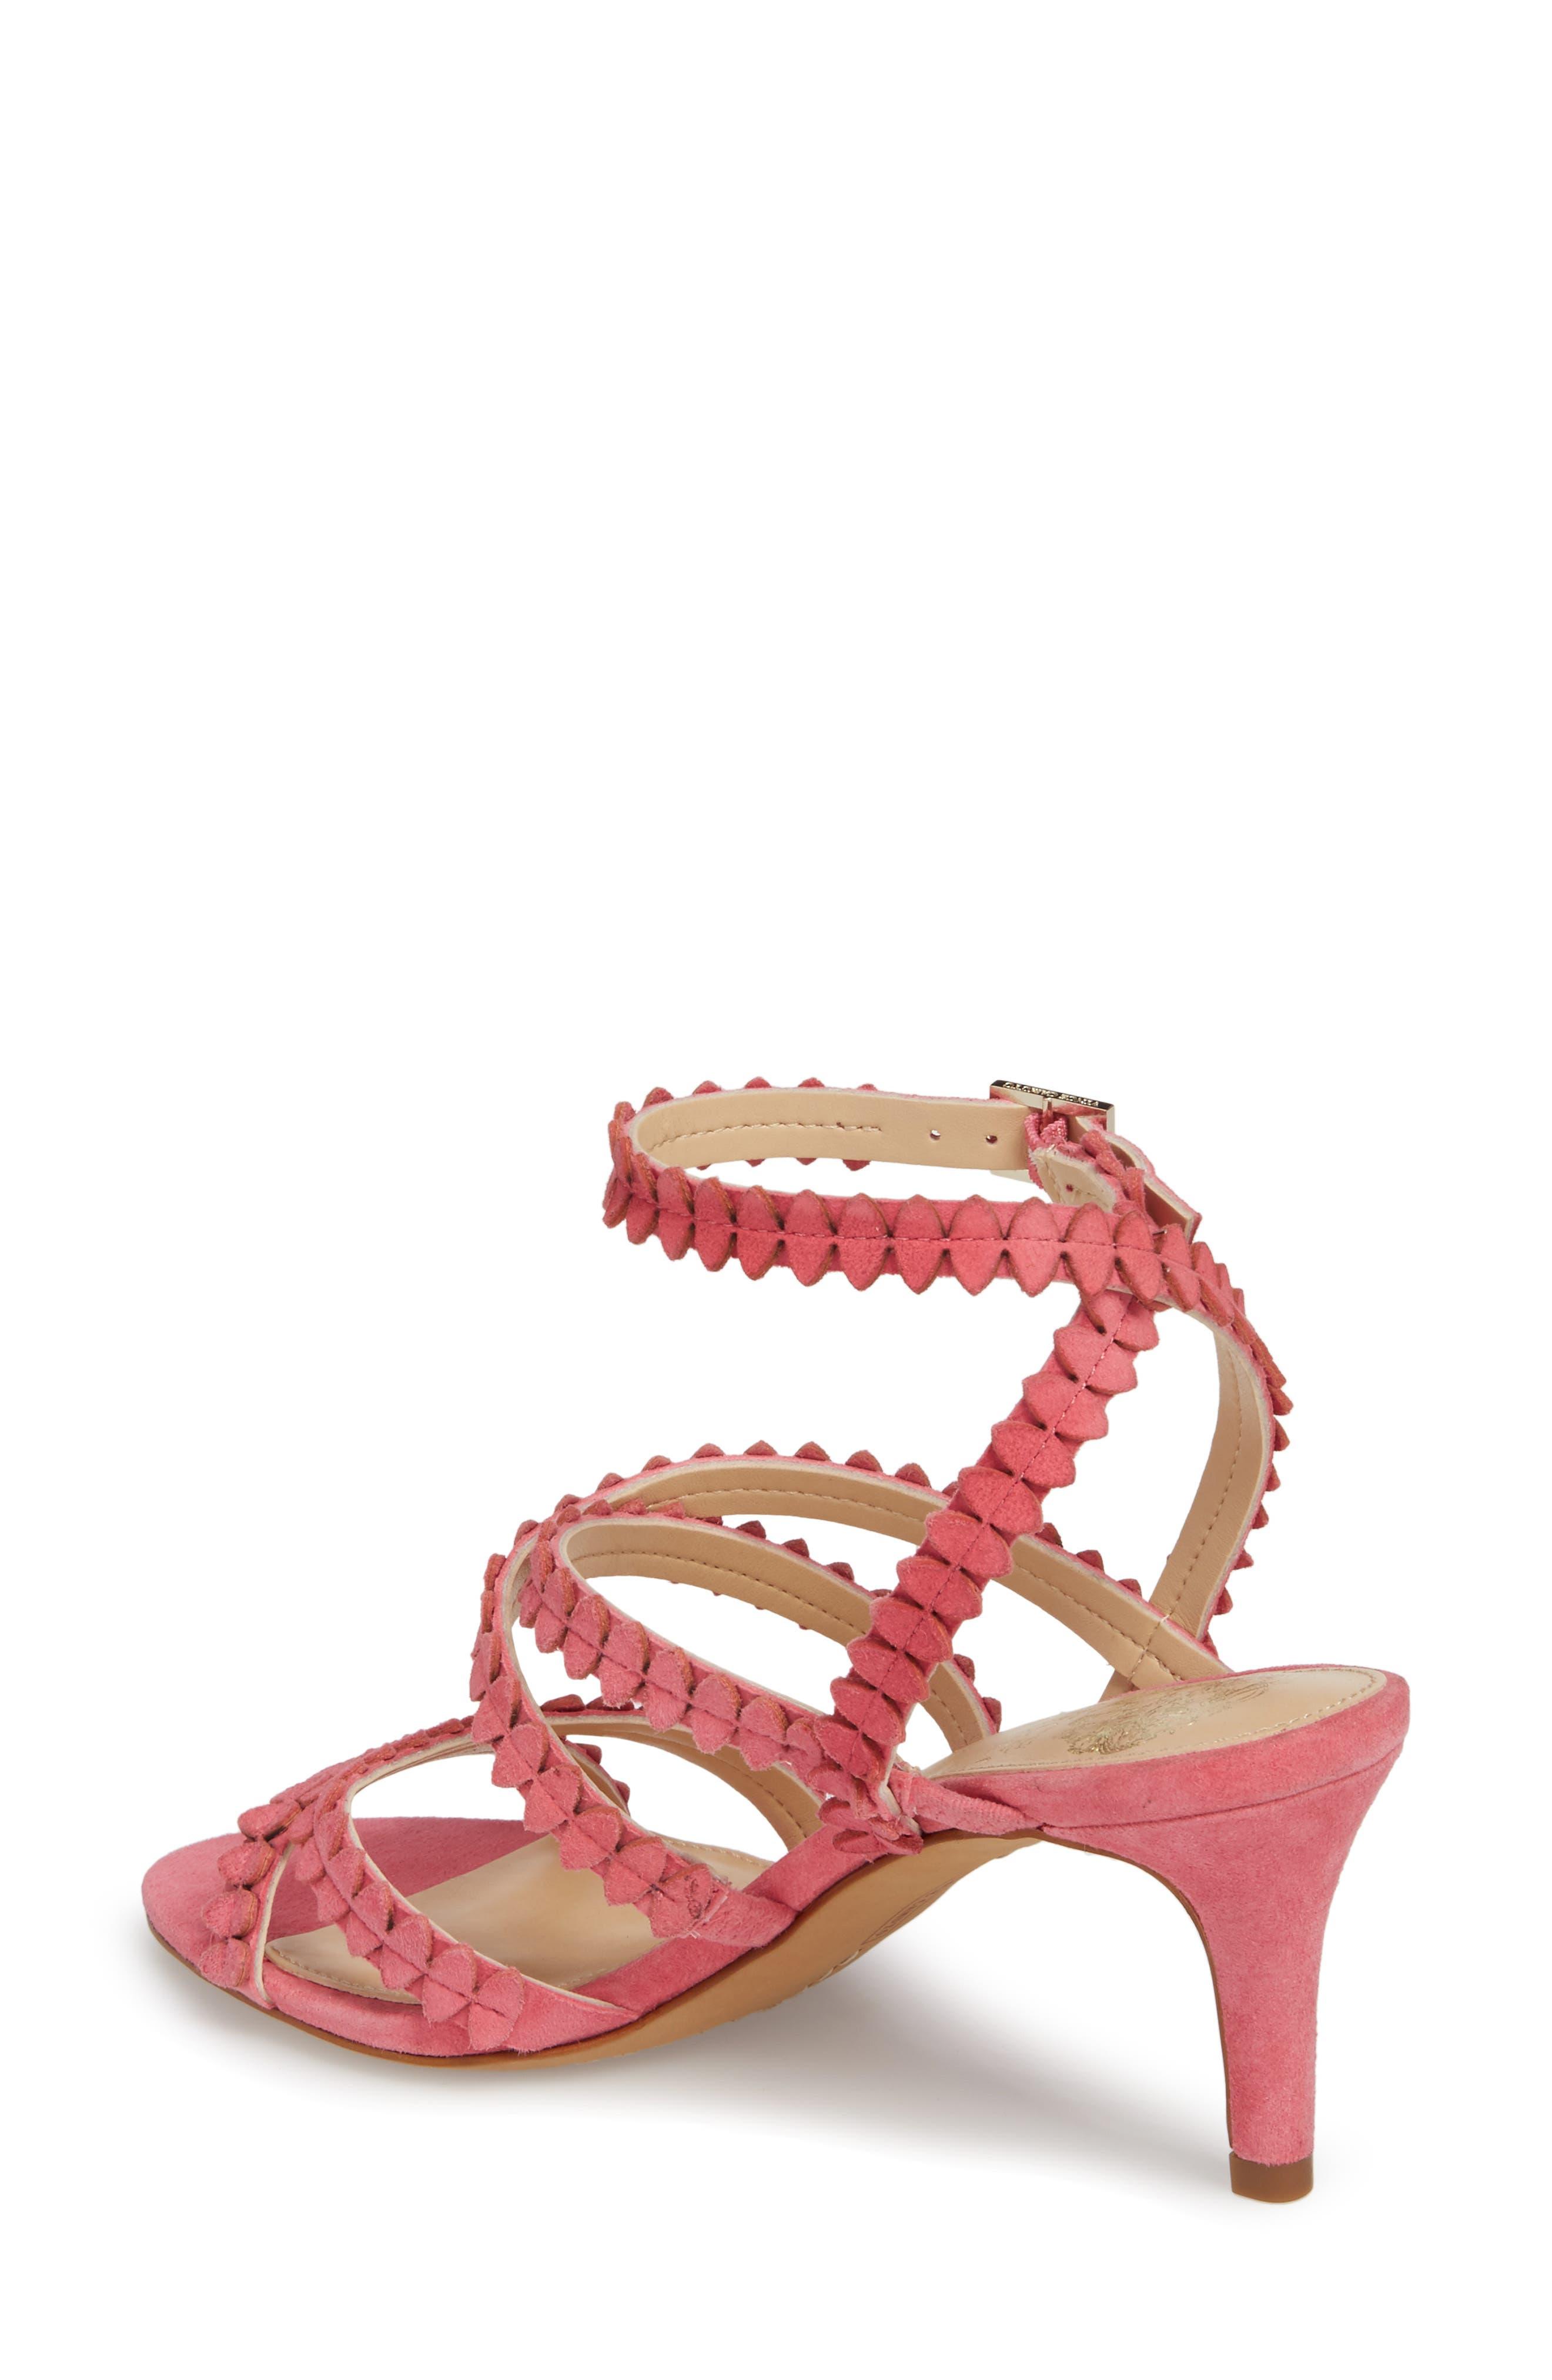 Yuria Sandal,                             Alternate thumbnail 2, color,                             Soft Pink Suede